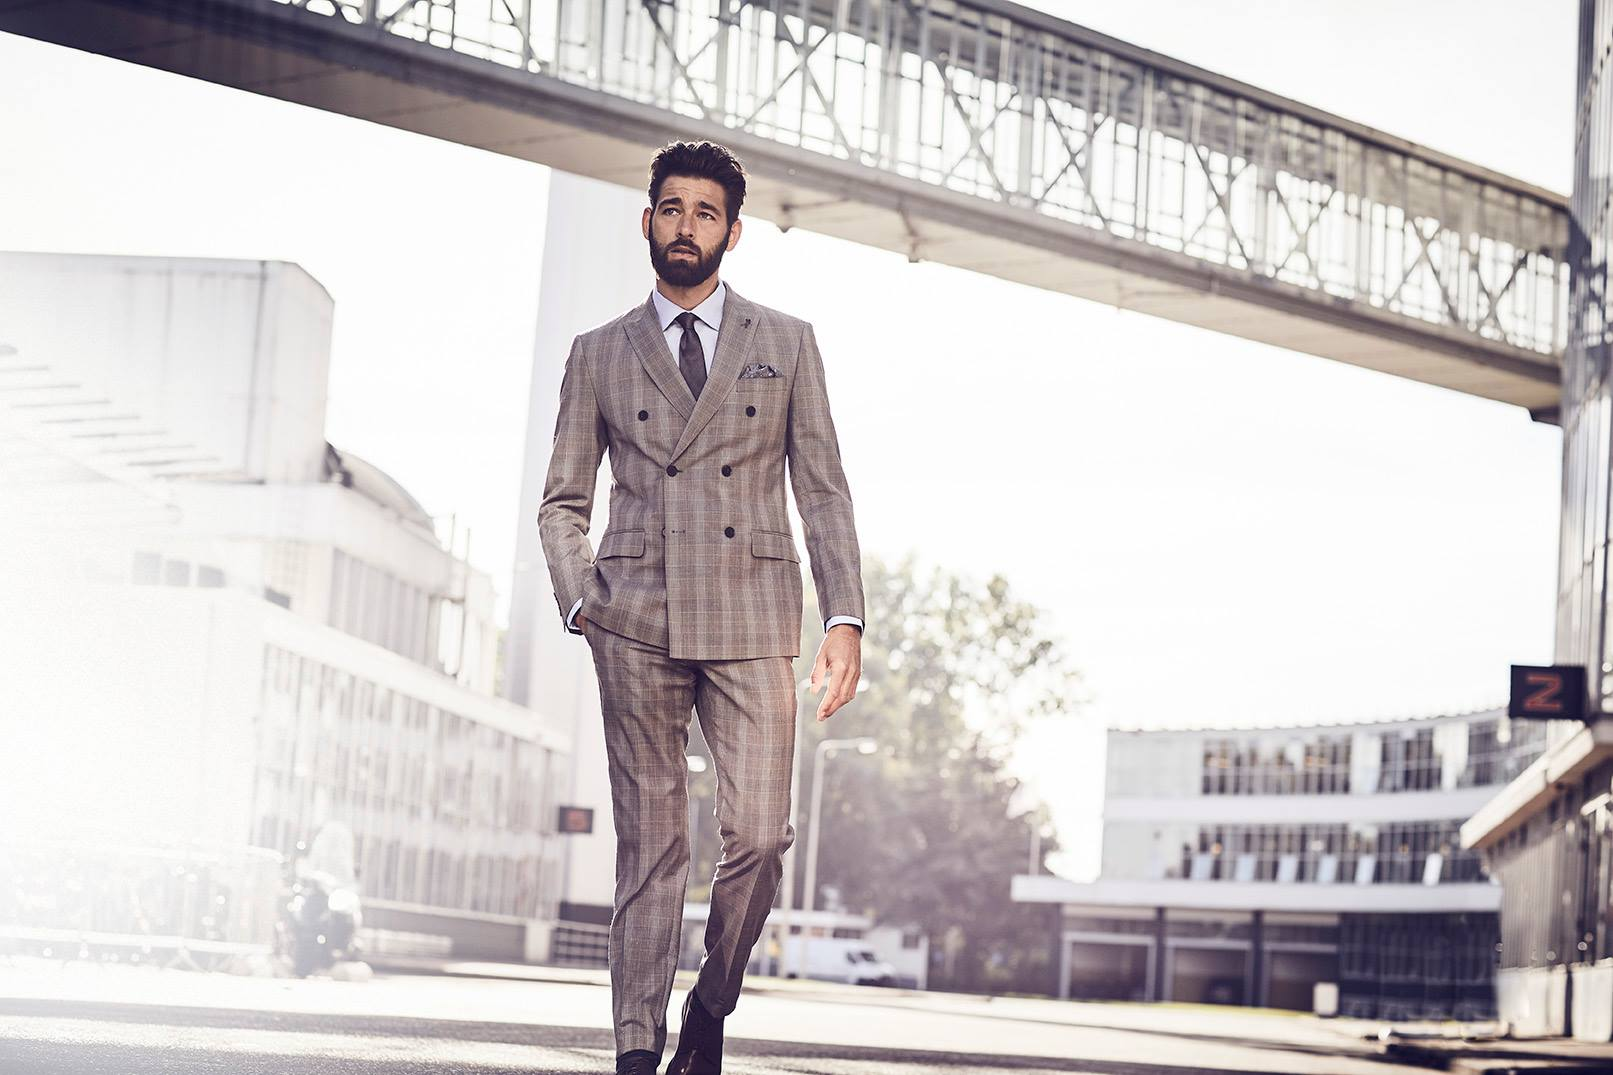 Wedding Suit - Joe Black Grey Wedding Suit